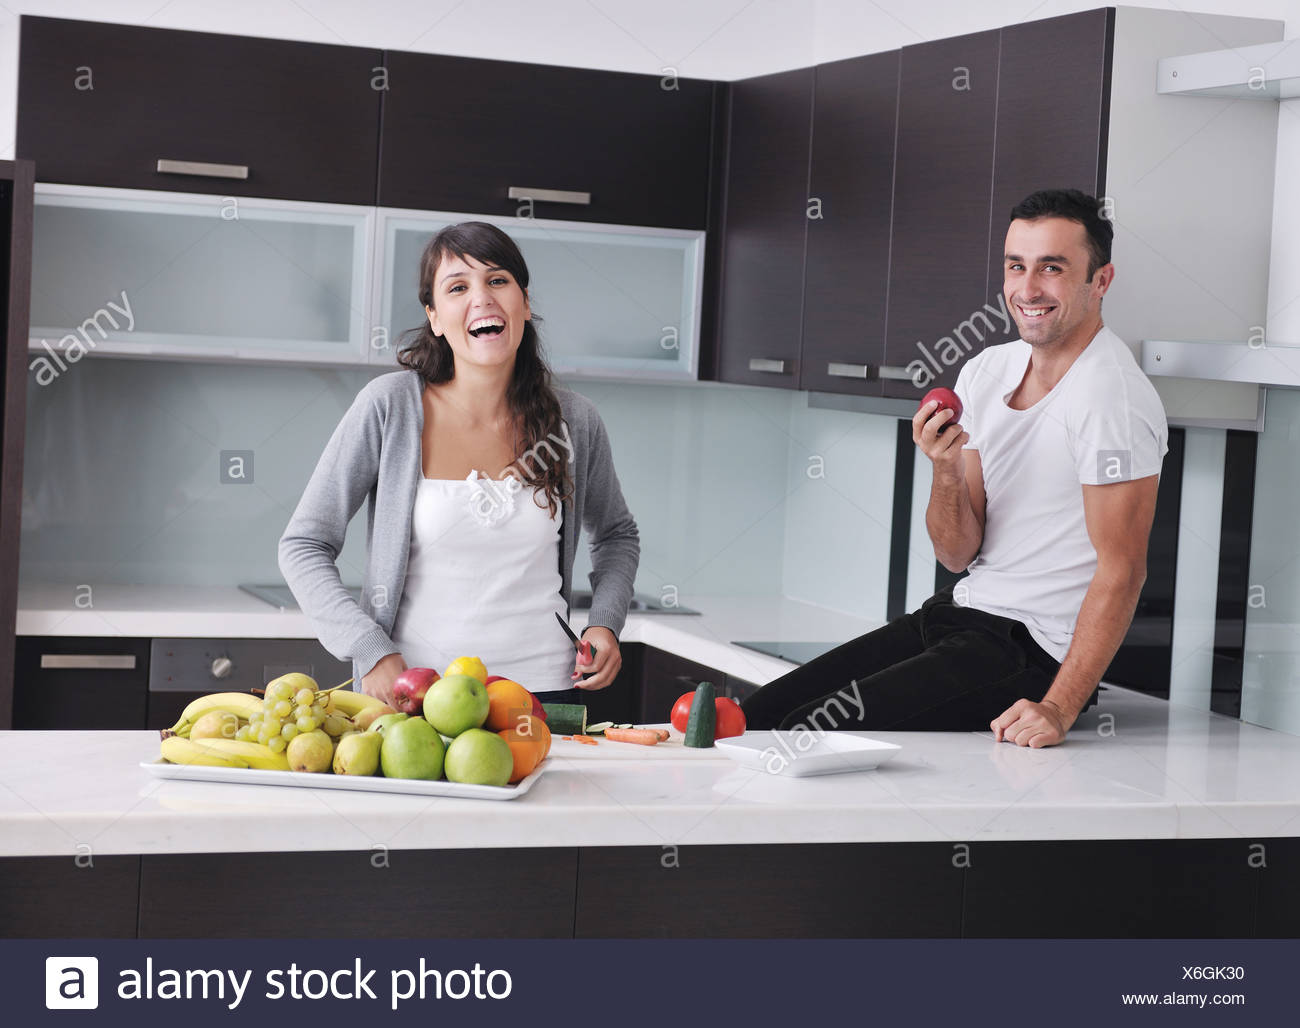 Two Women In Kitchen Stock Photos & Two Women In Kitchen Stock ...